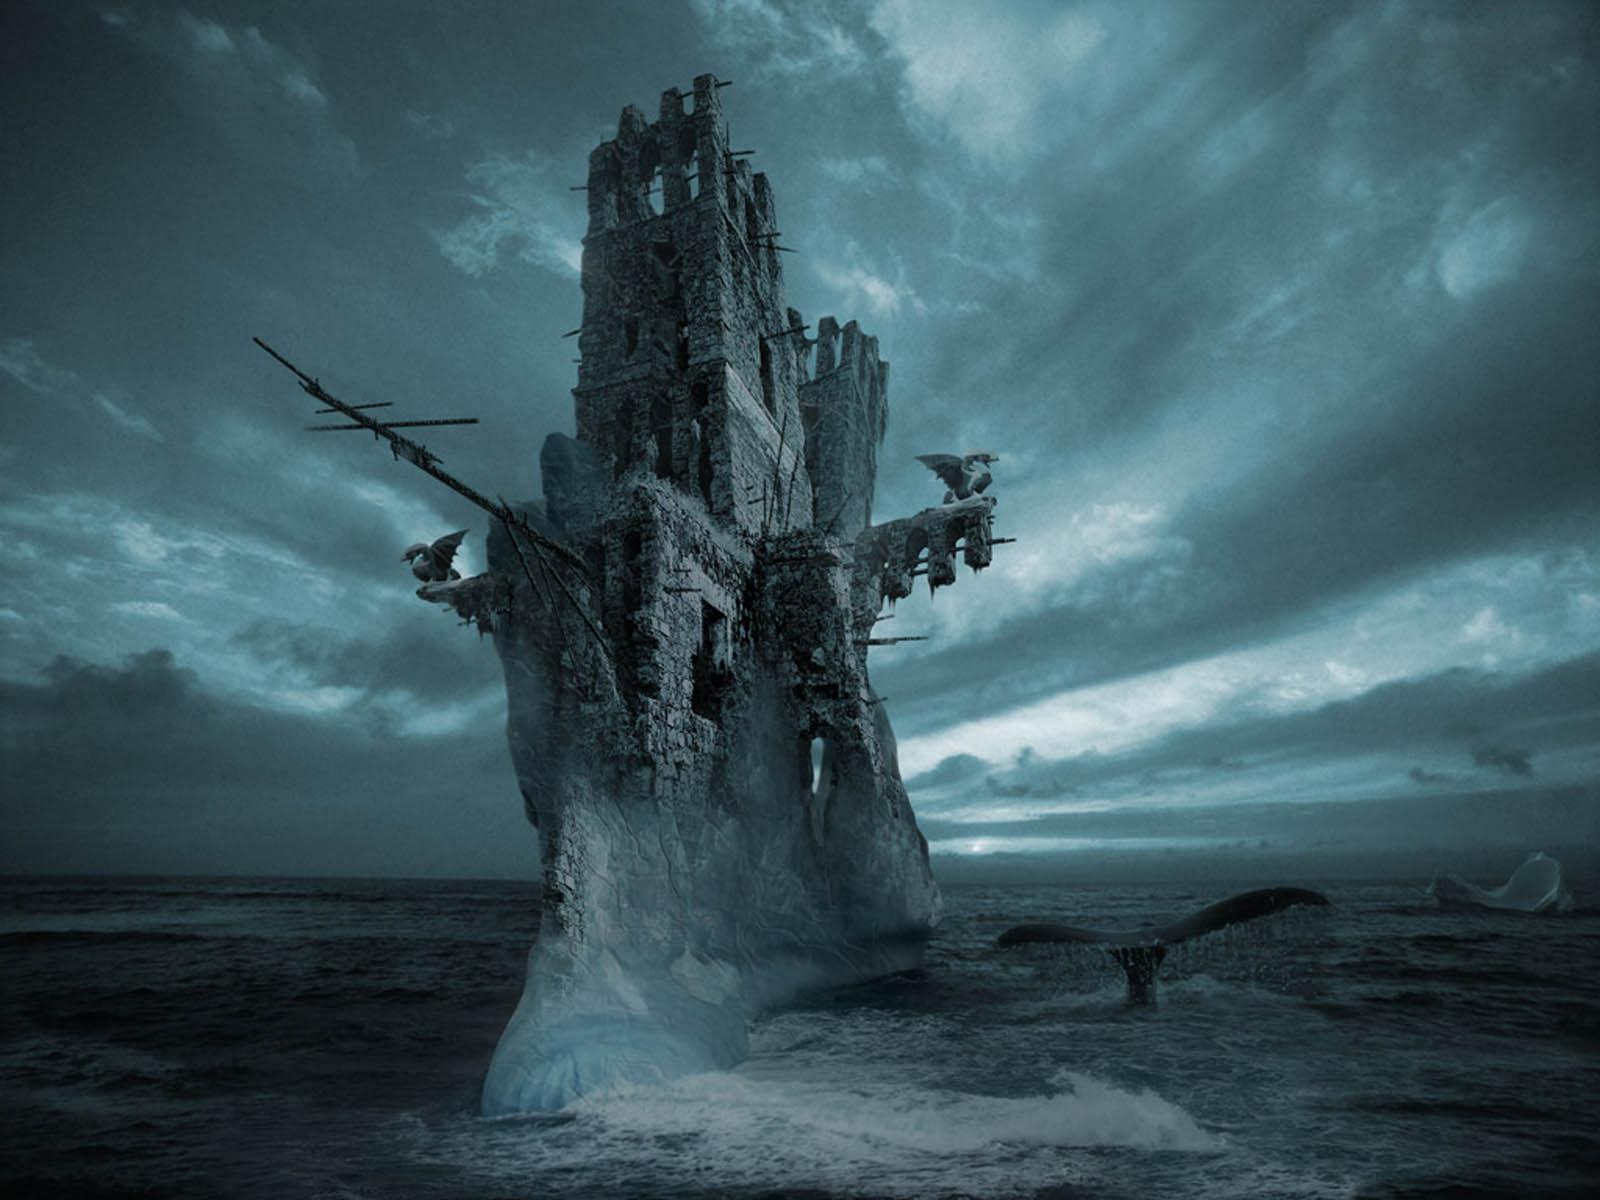 Ghost Ship Desktop Wallpaper 1600x1200